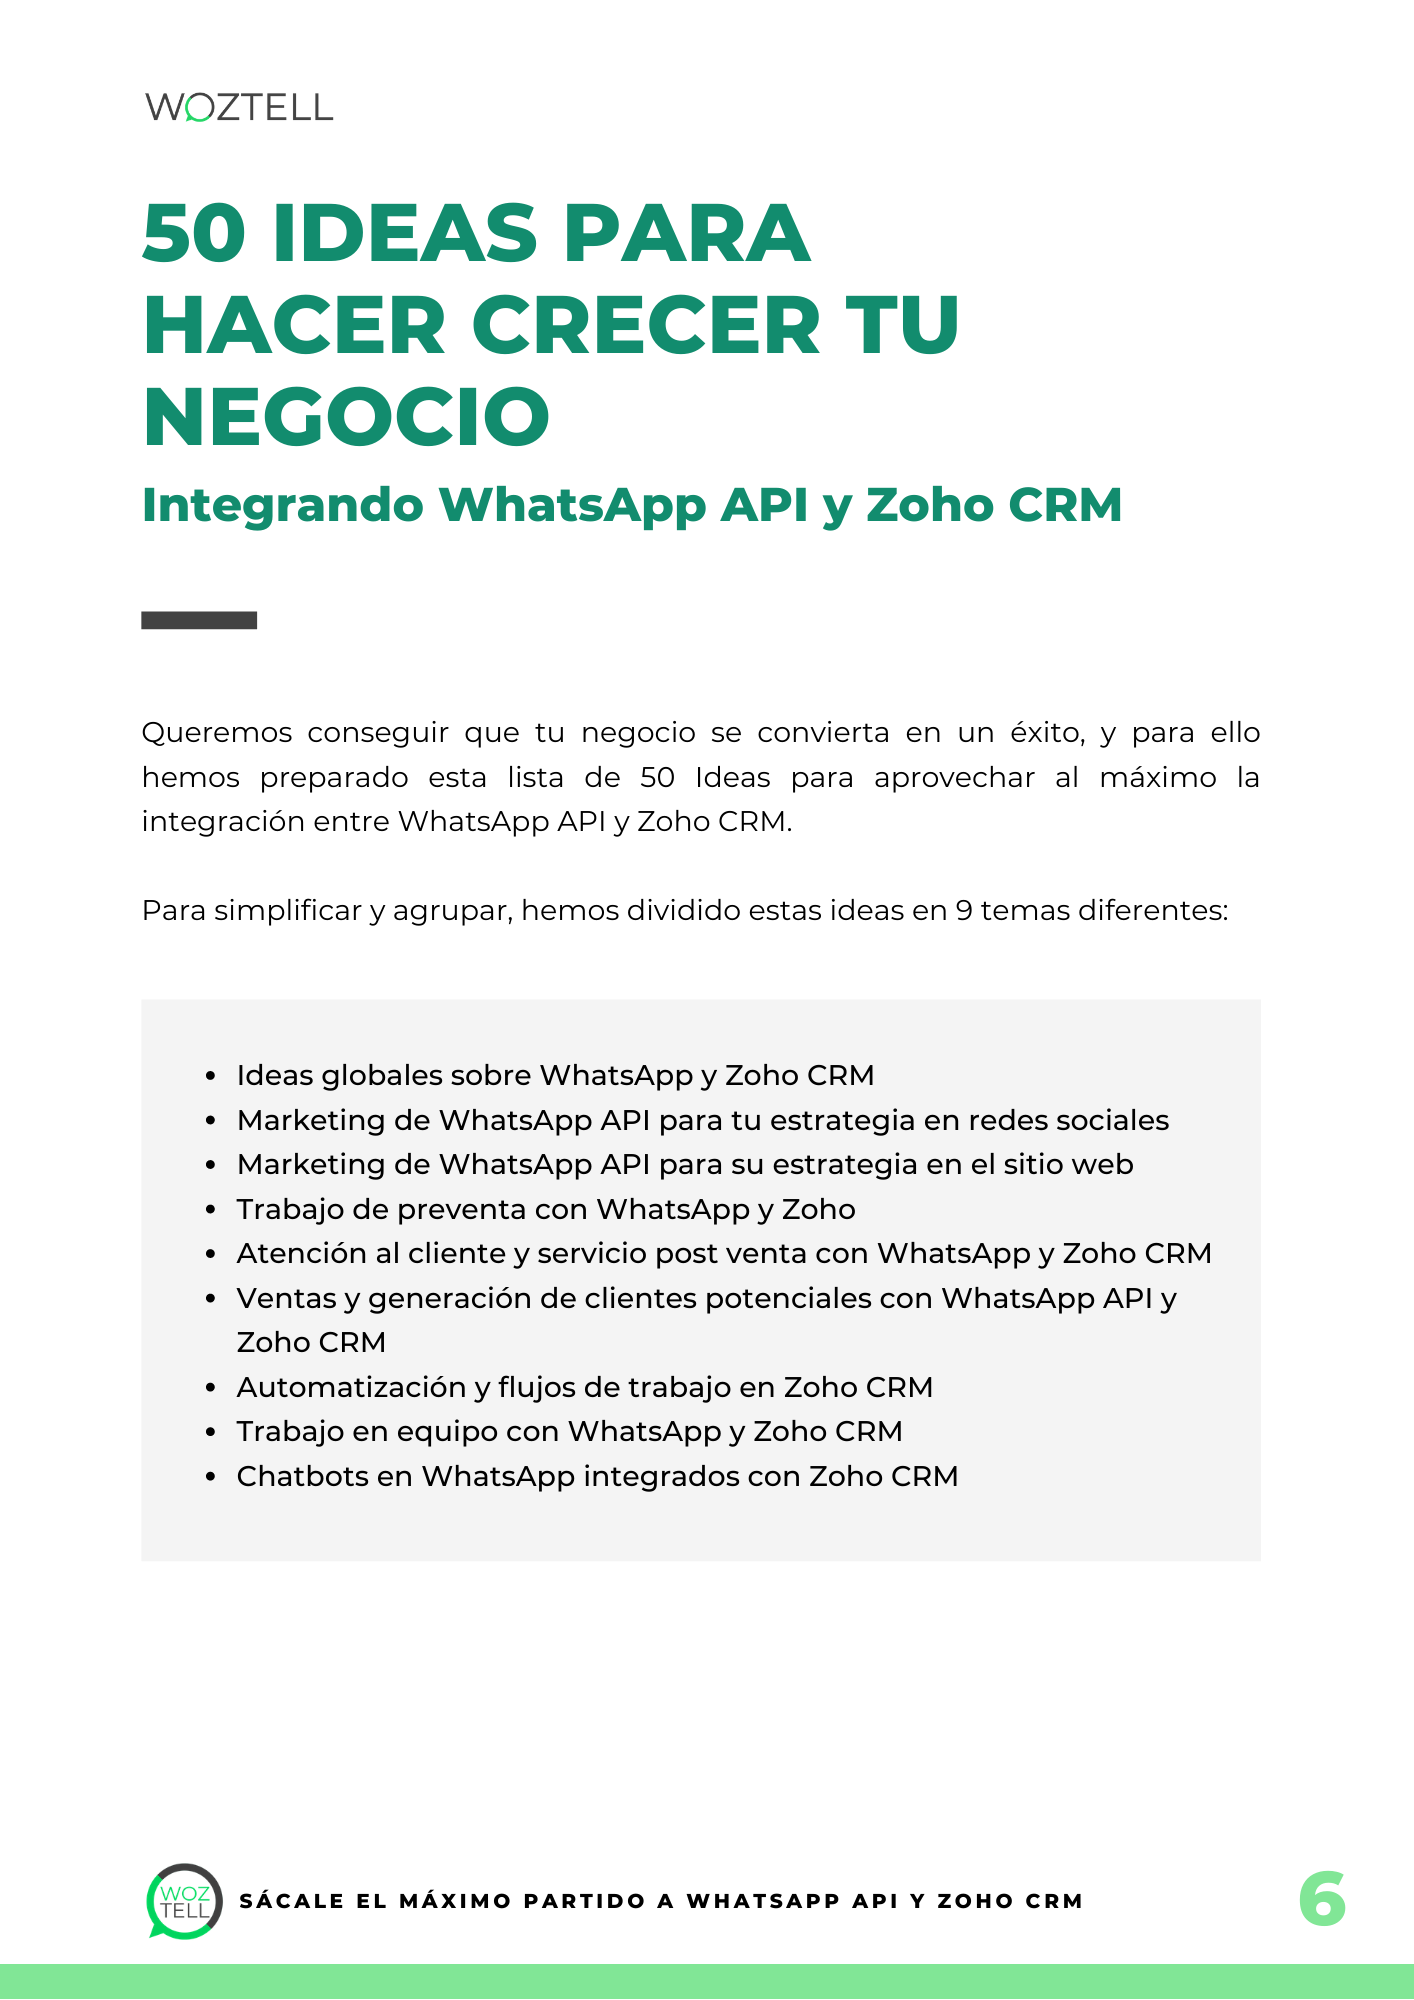 Sácale el máximo partido a WhatsApp API y Zoho CRM